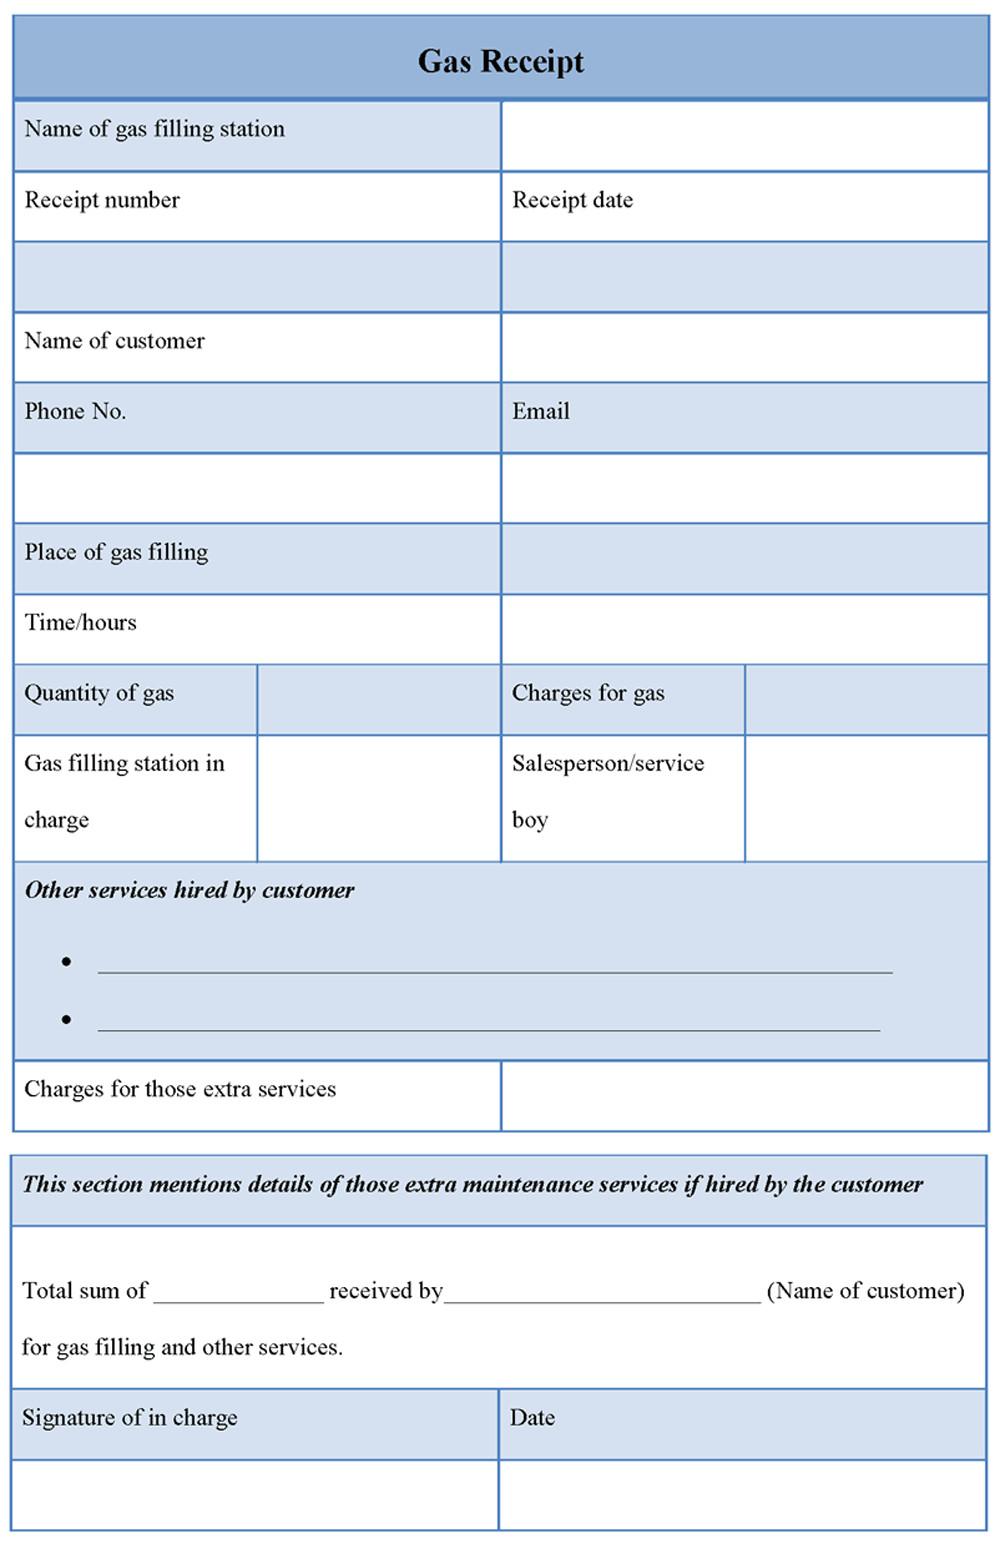 Gas Receipt Template Gas Receipt Template format format Of Gas Receipt